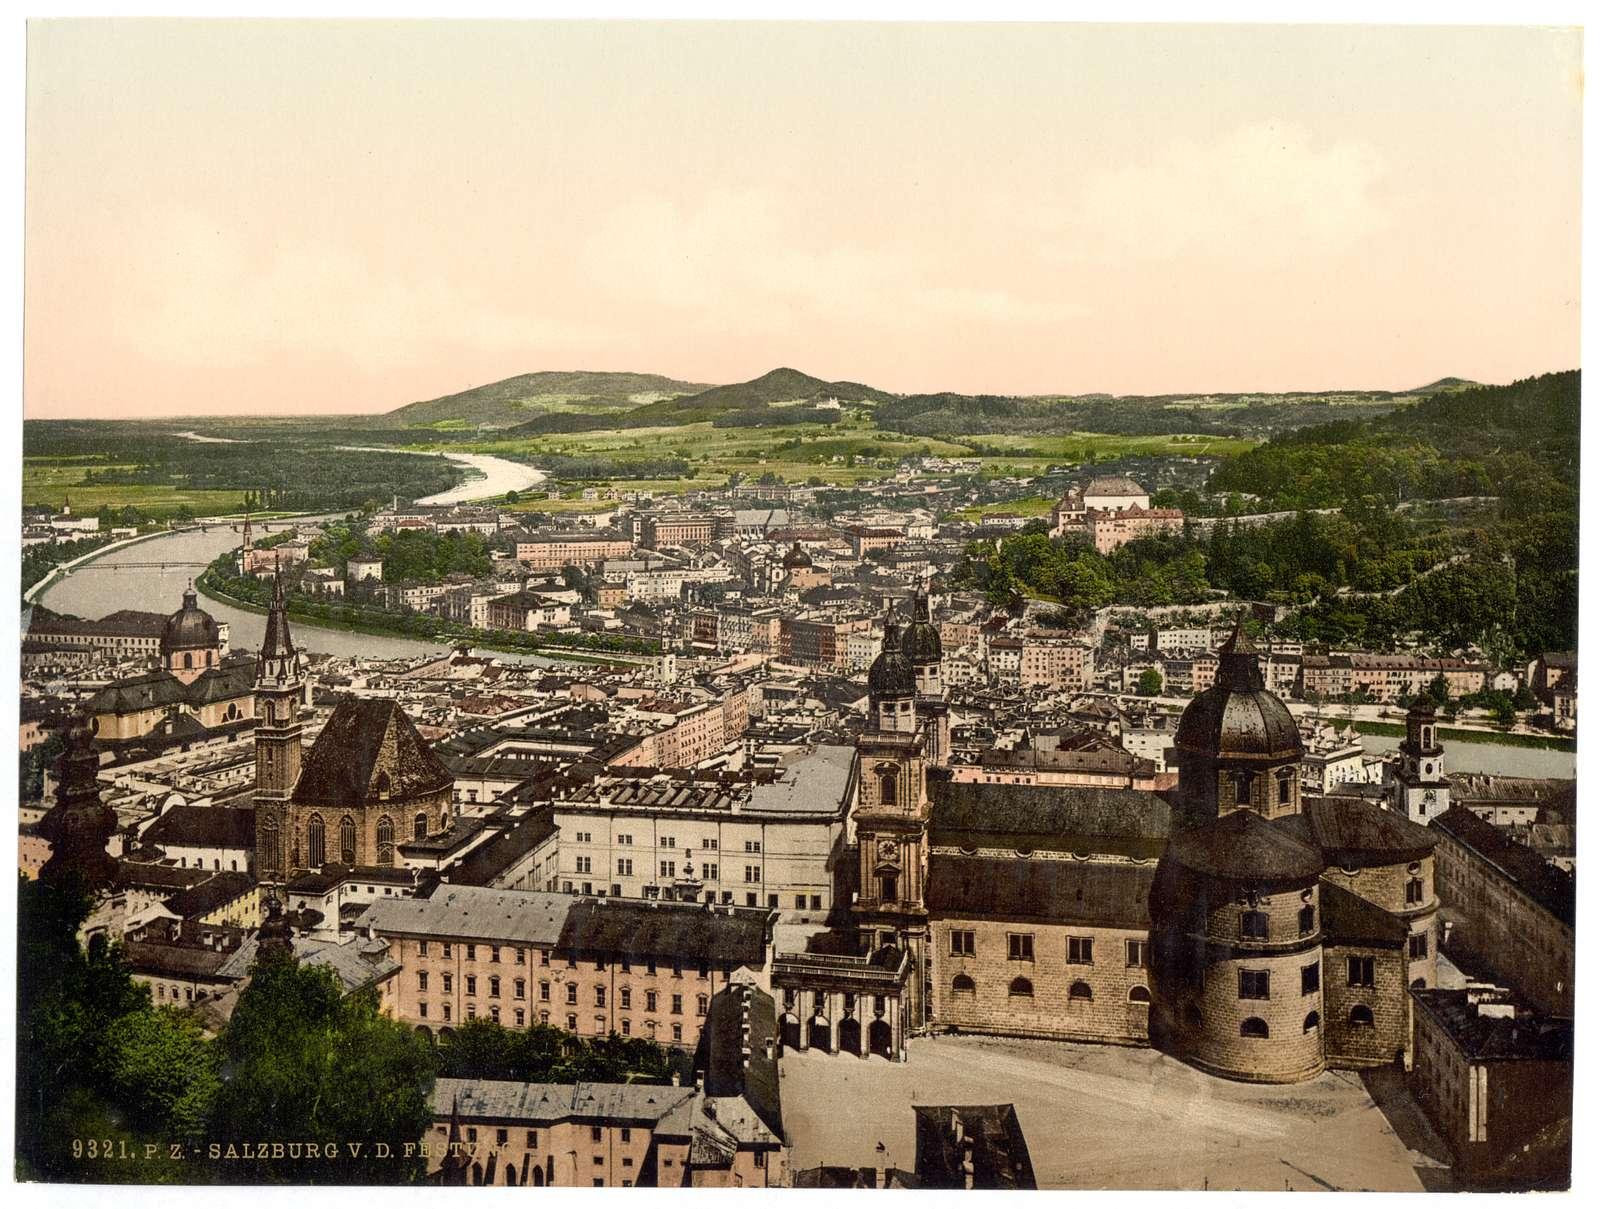 [Salzburg, from Maria Plain, Austro-Hungary]